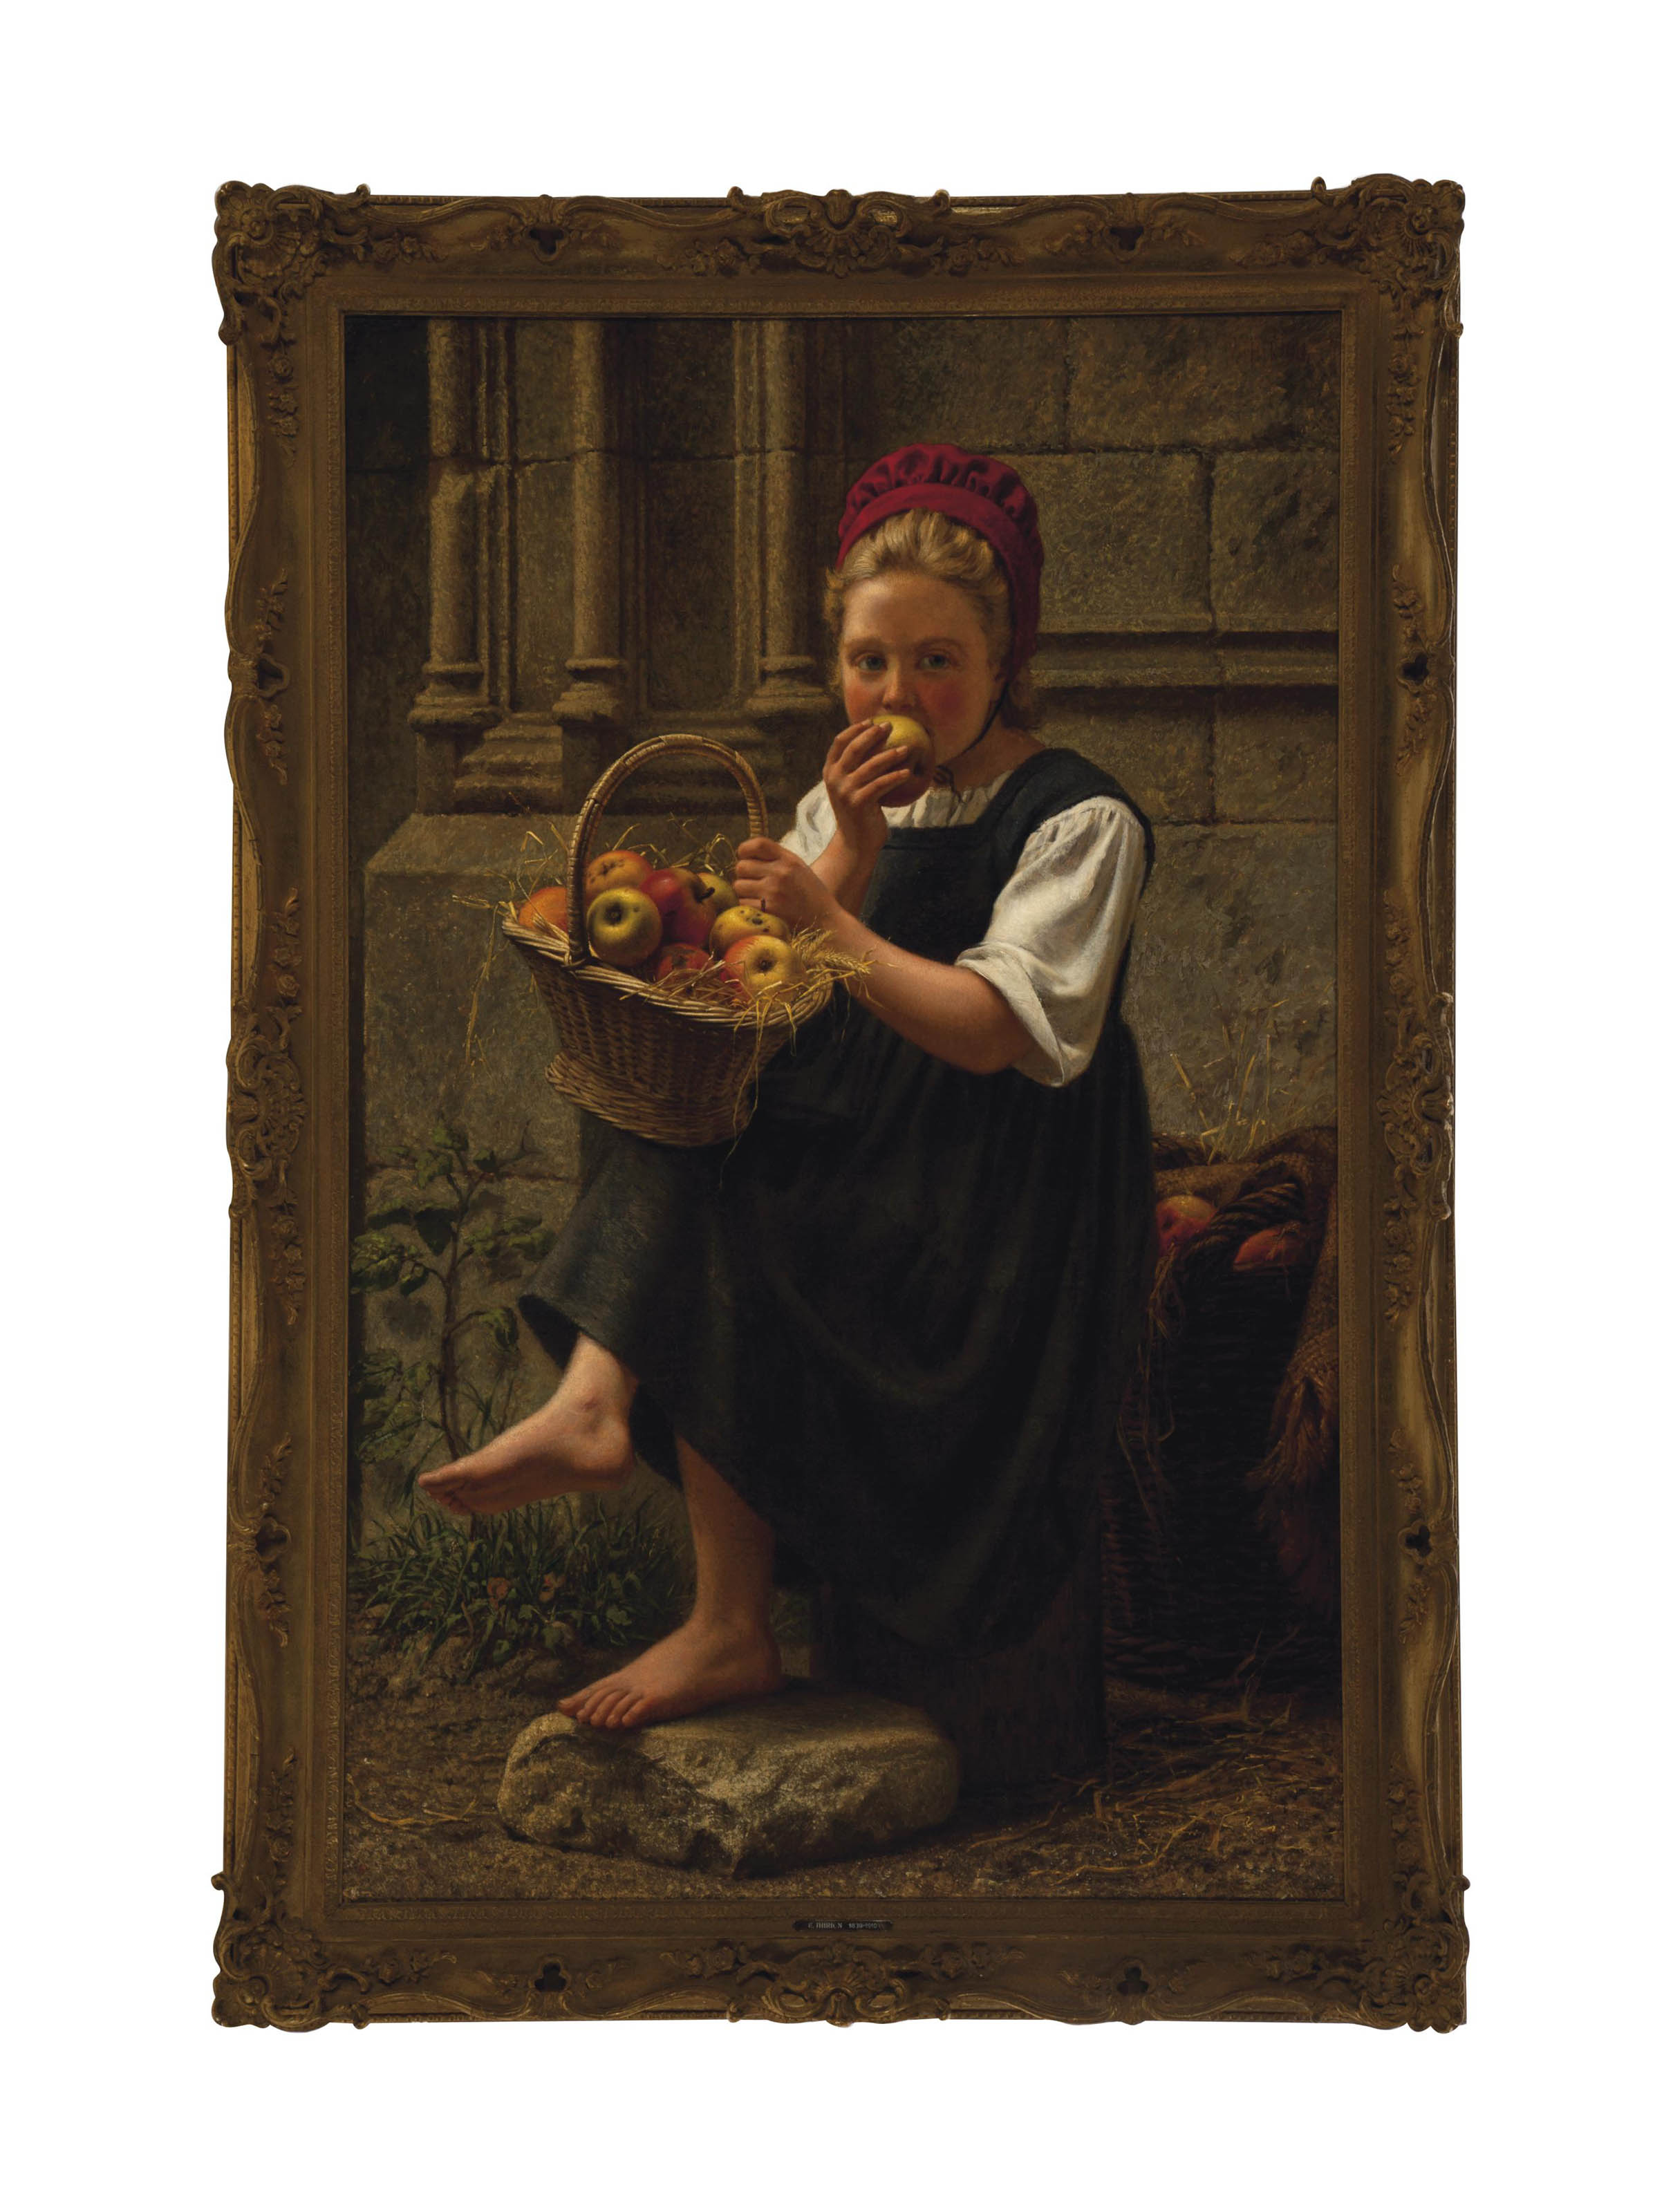 Peasant girl eating an apple